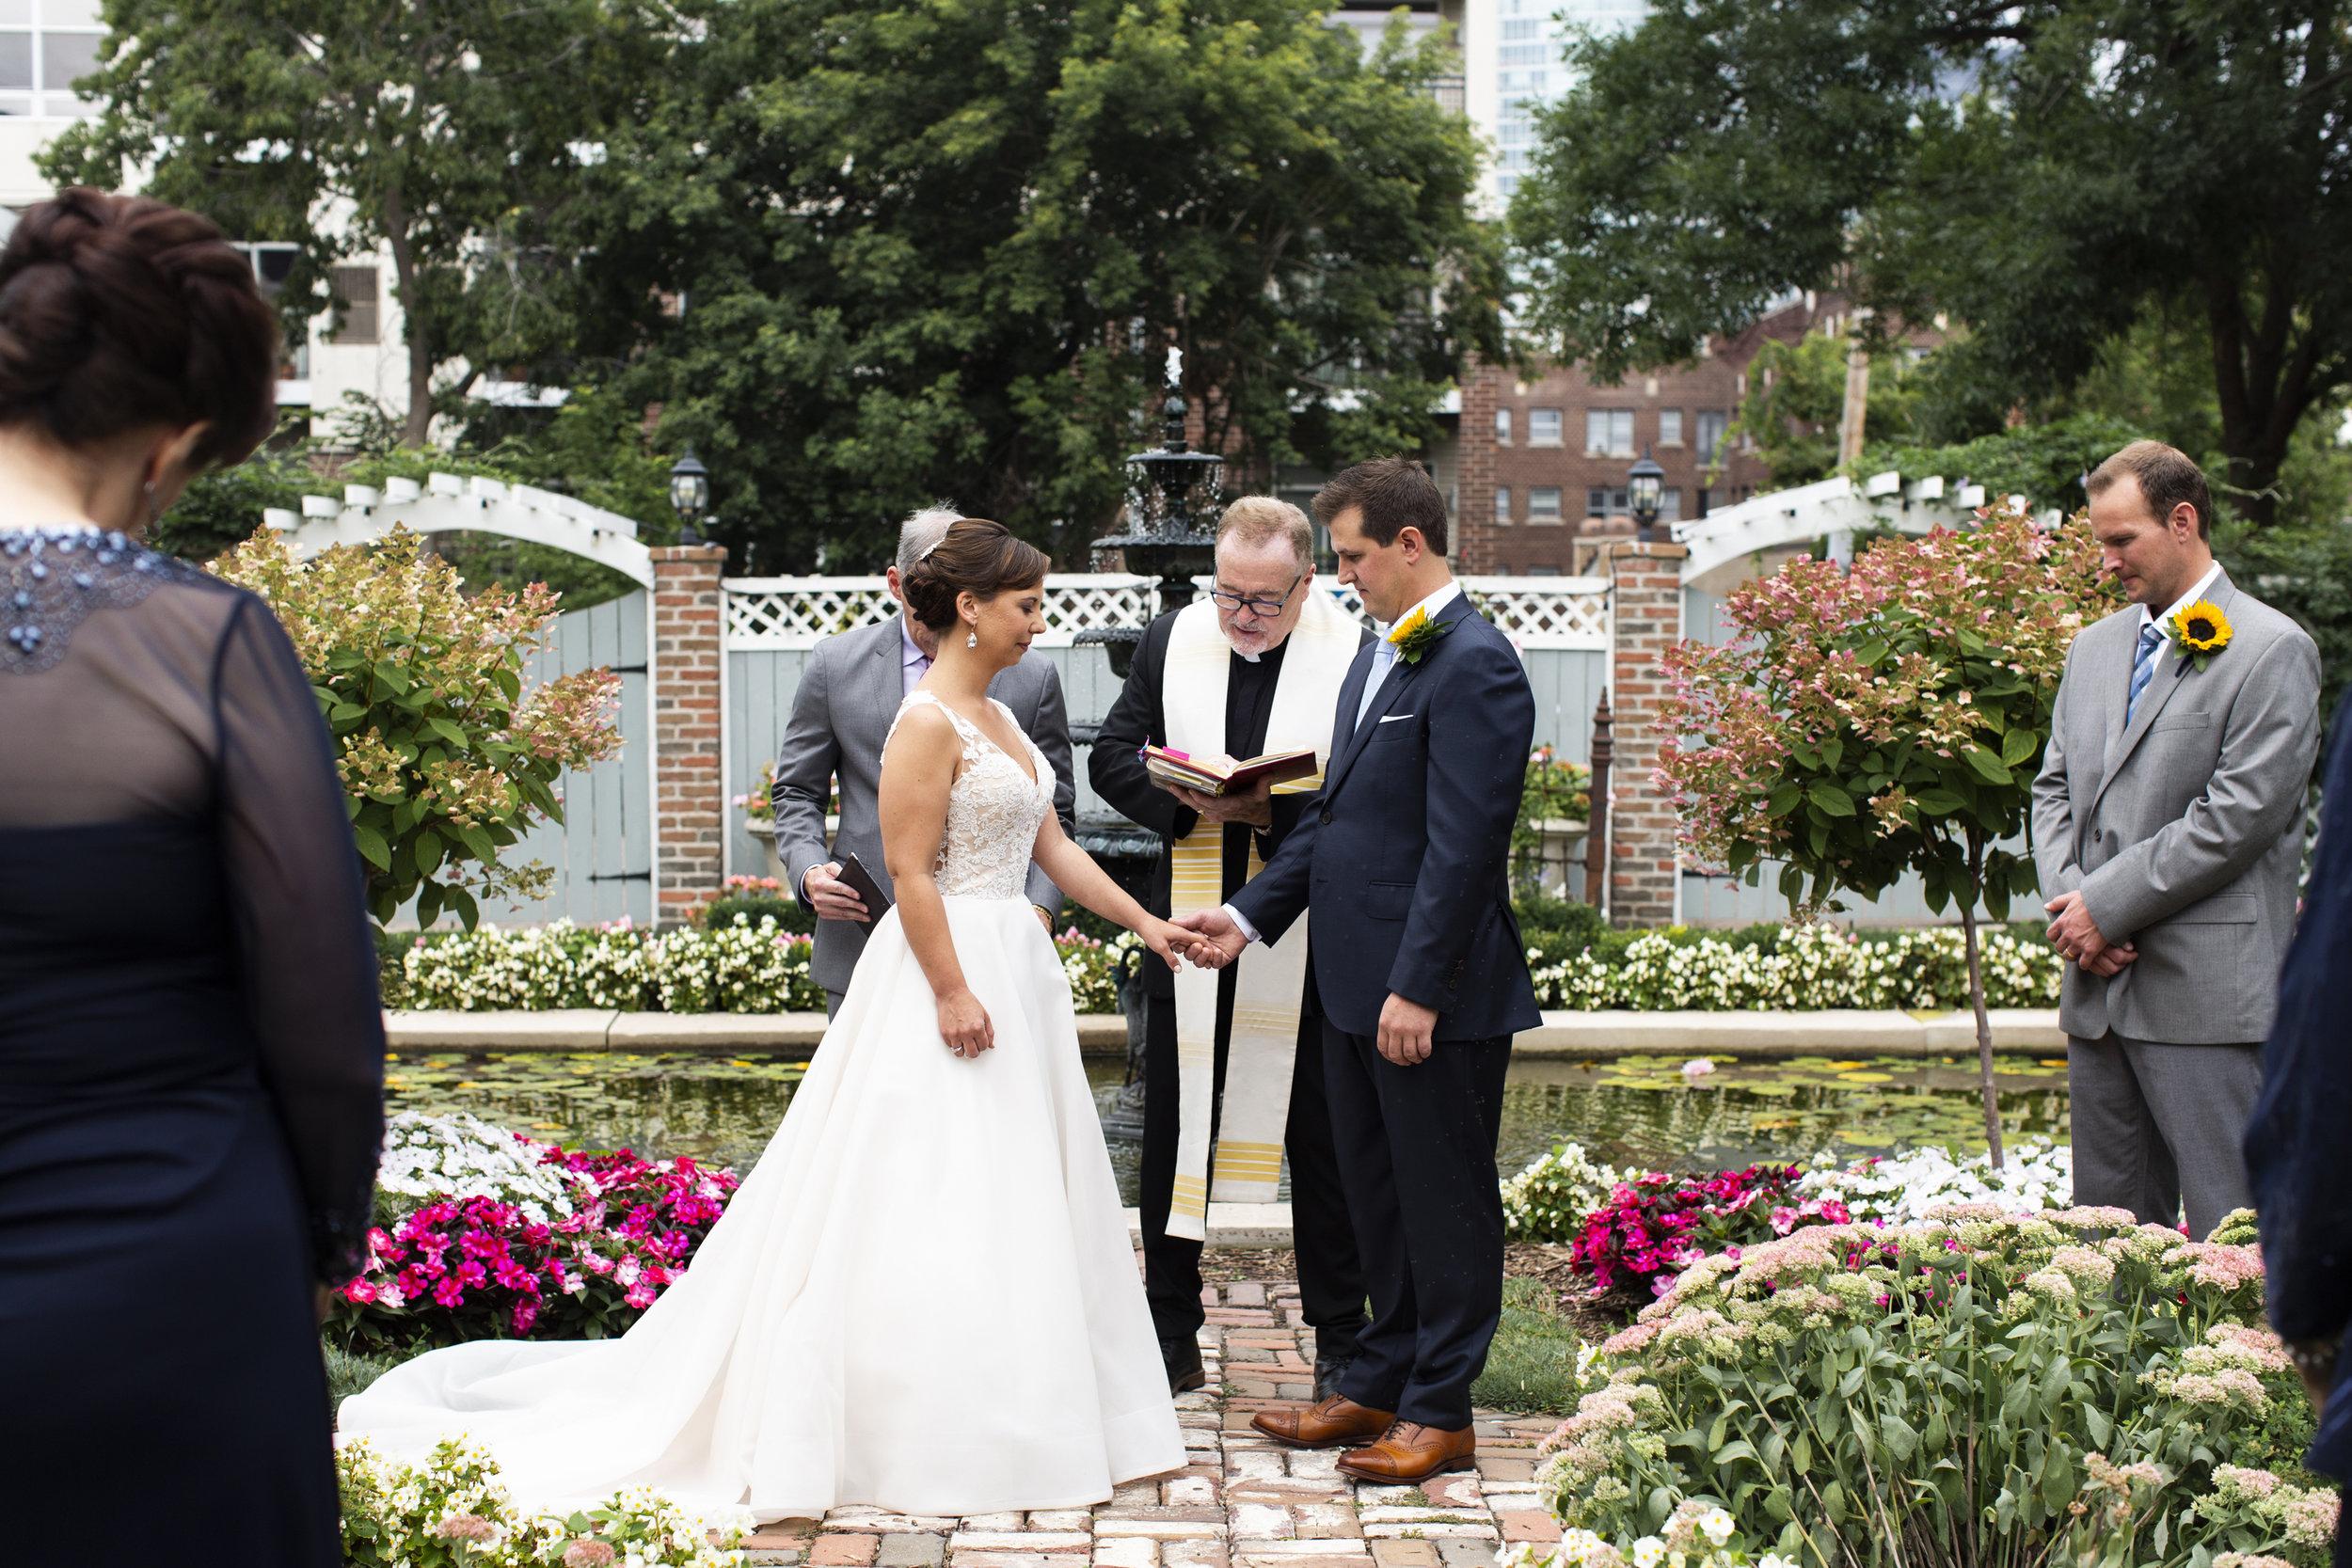 300 Clifton Wedding Minneapolis, MN | Photography by Jess Ekstrand | Rivets & Roses